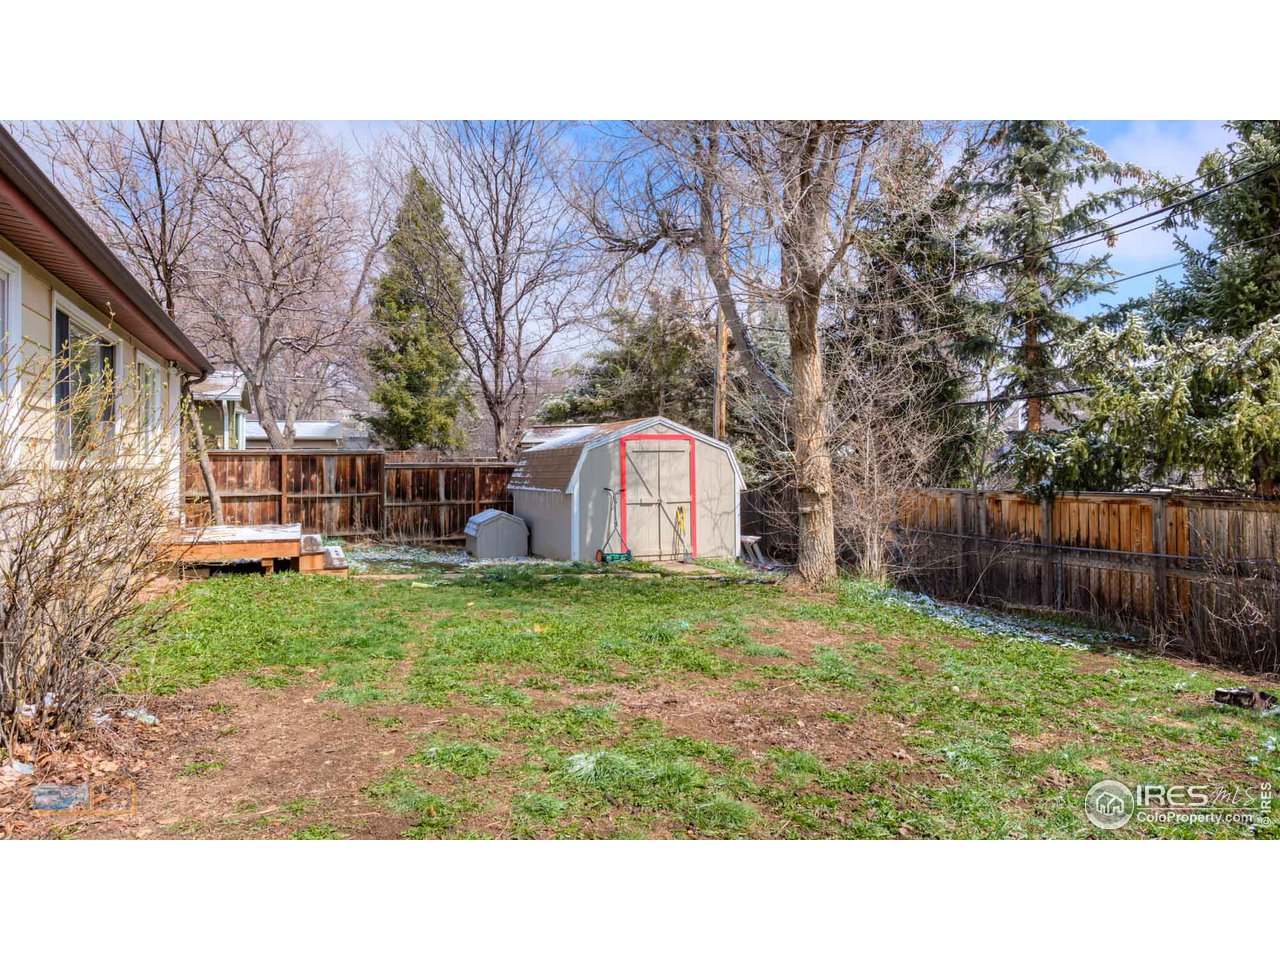 Big storage shed included. Fully fenced back yard.